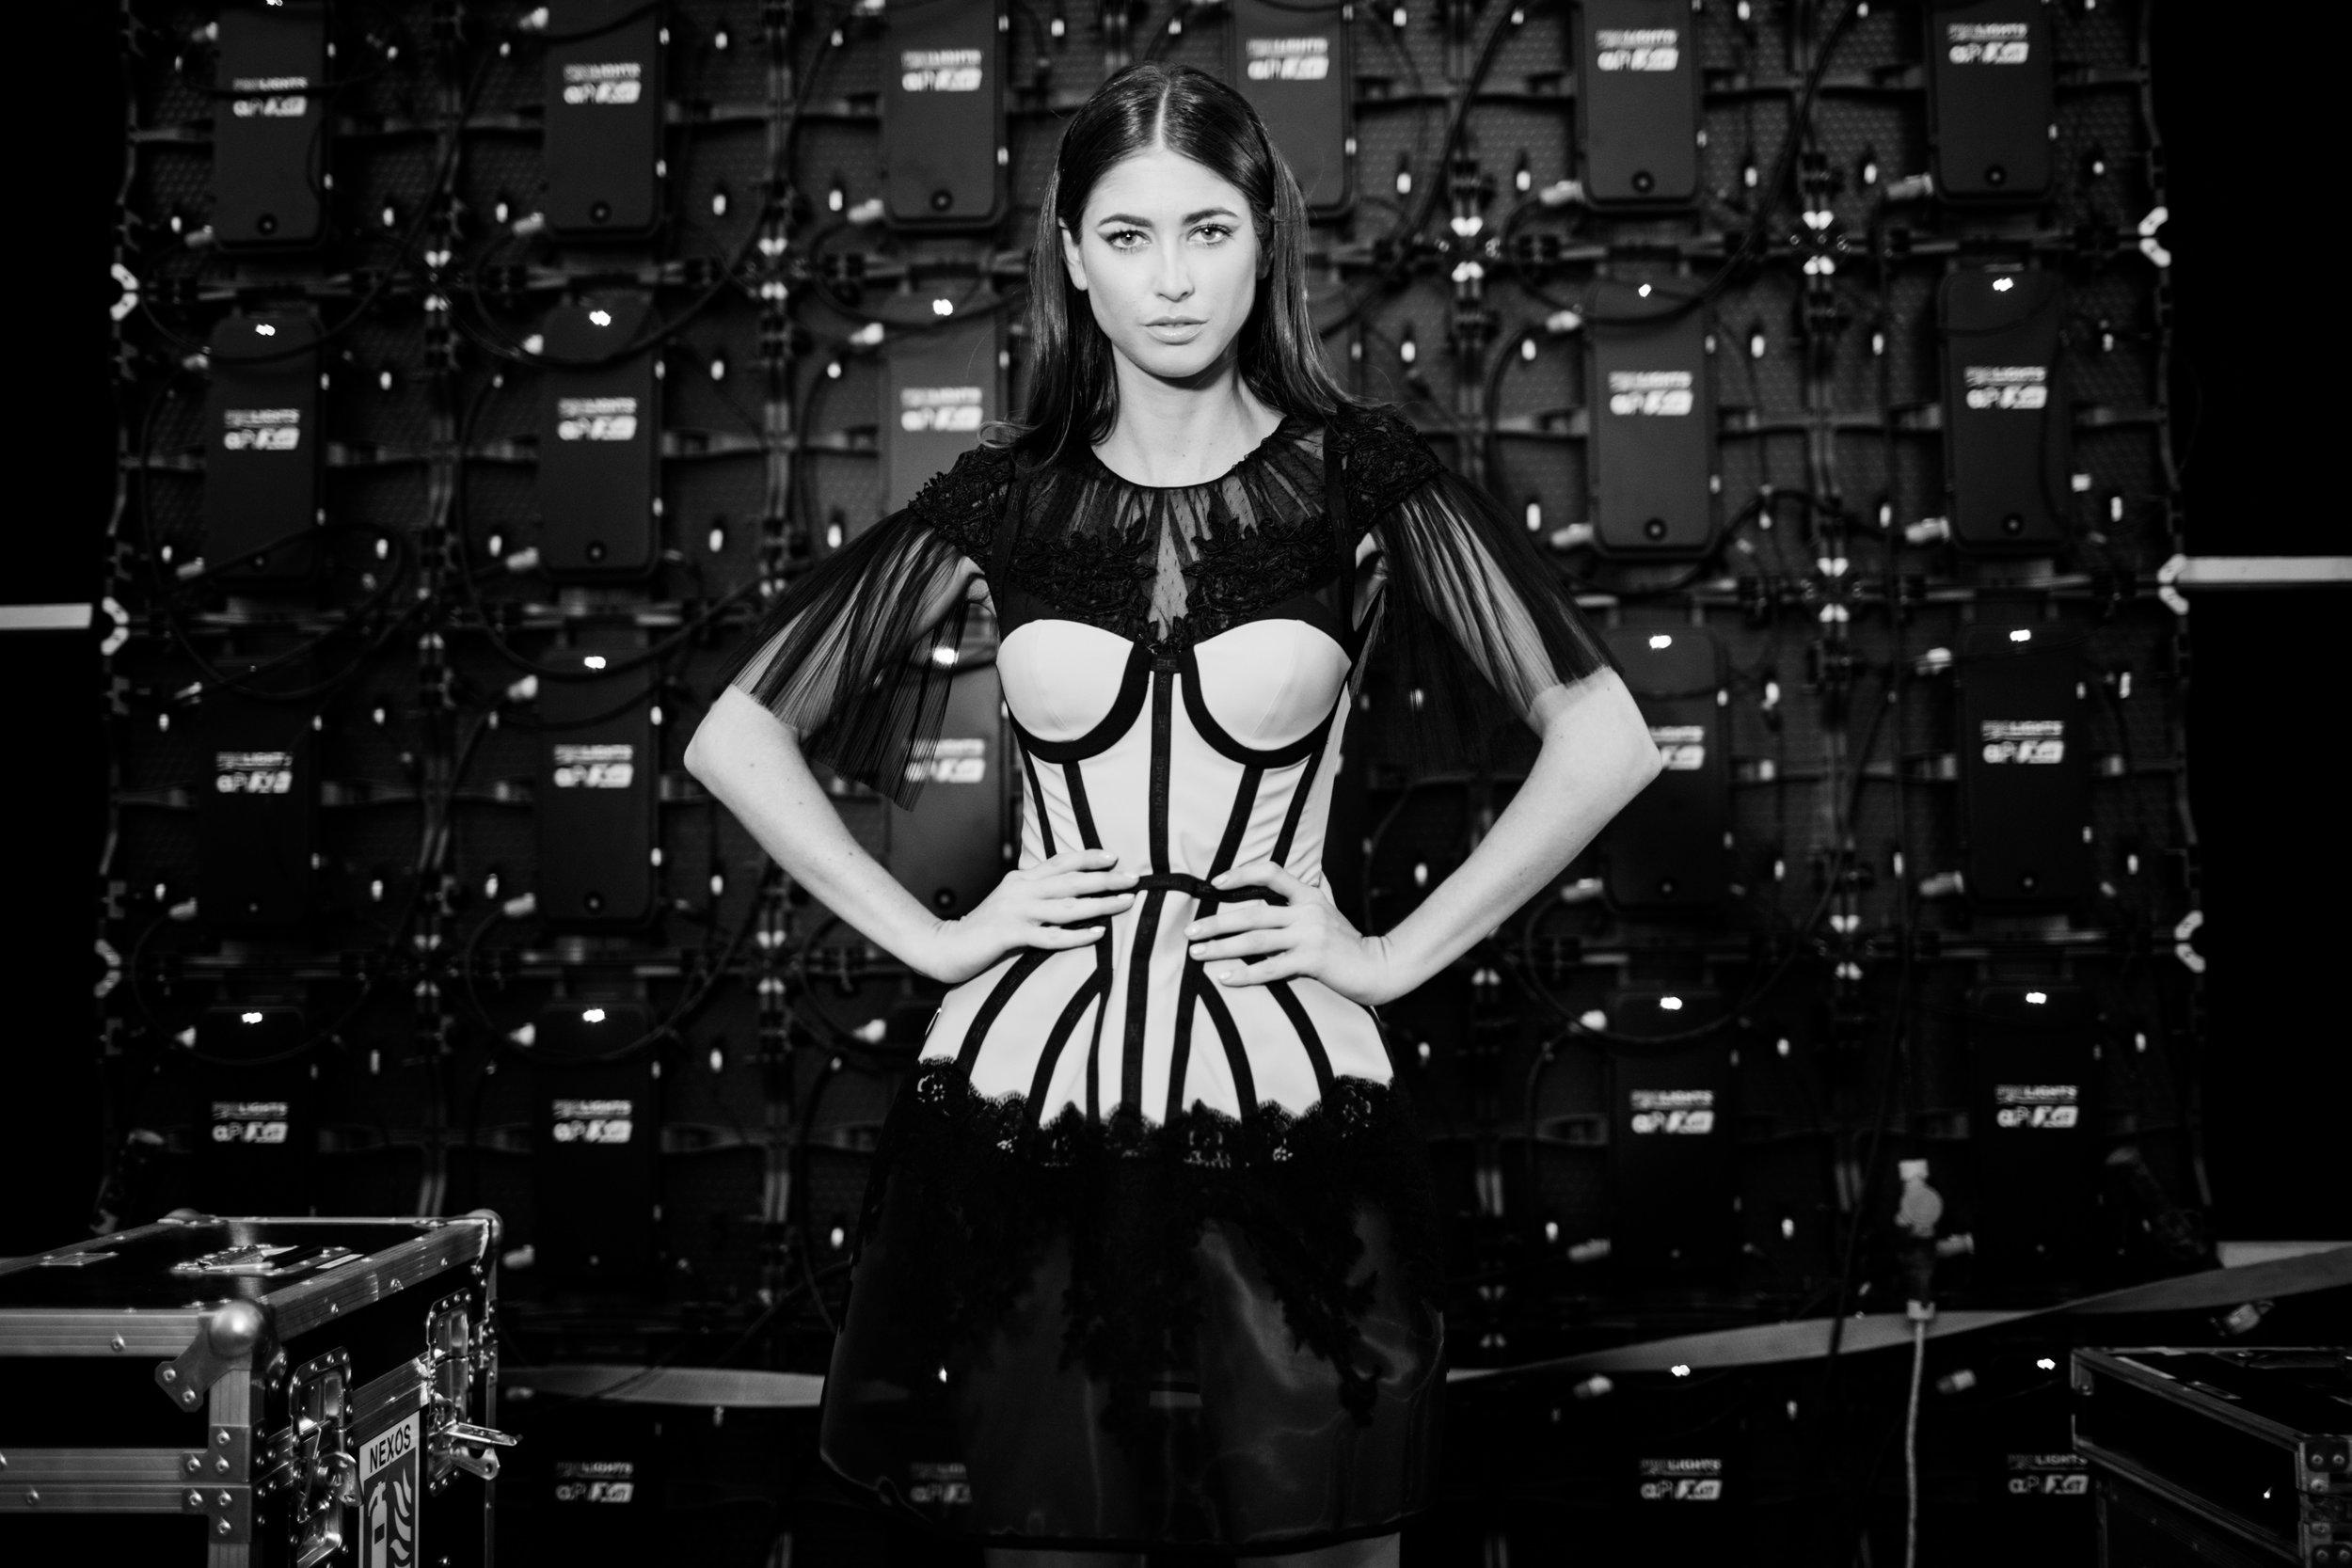 Dizz Fashion Show -Backstage, Malta Fashion Week